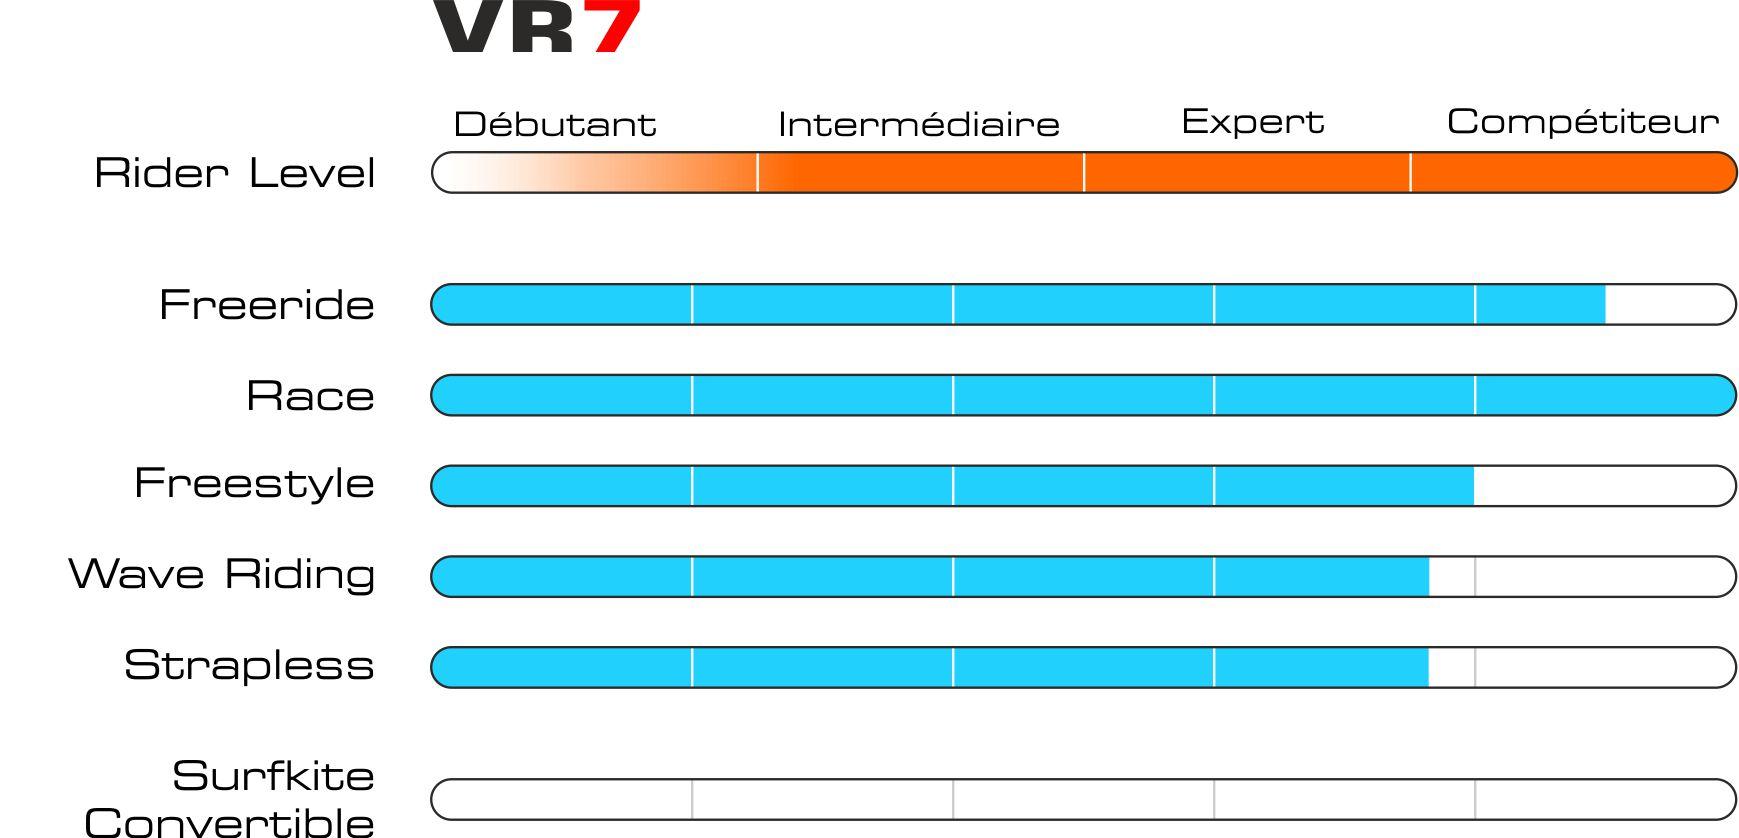 Graphique vr7 fr